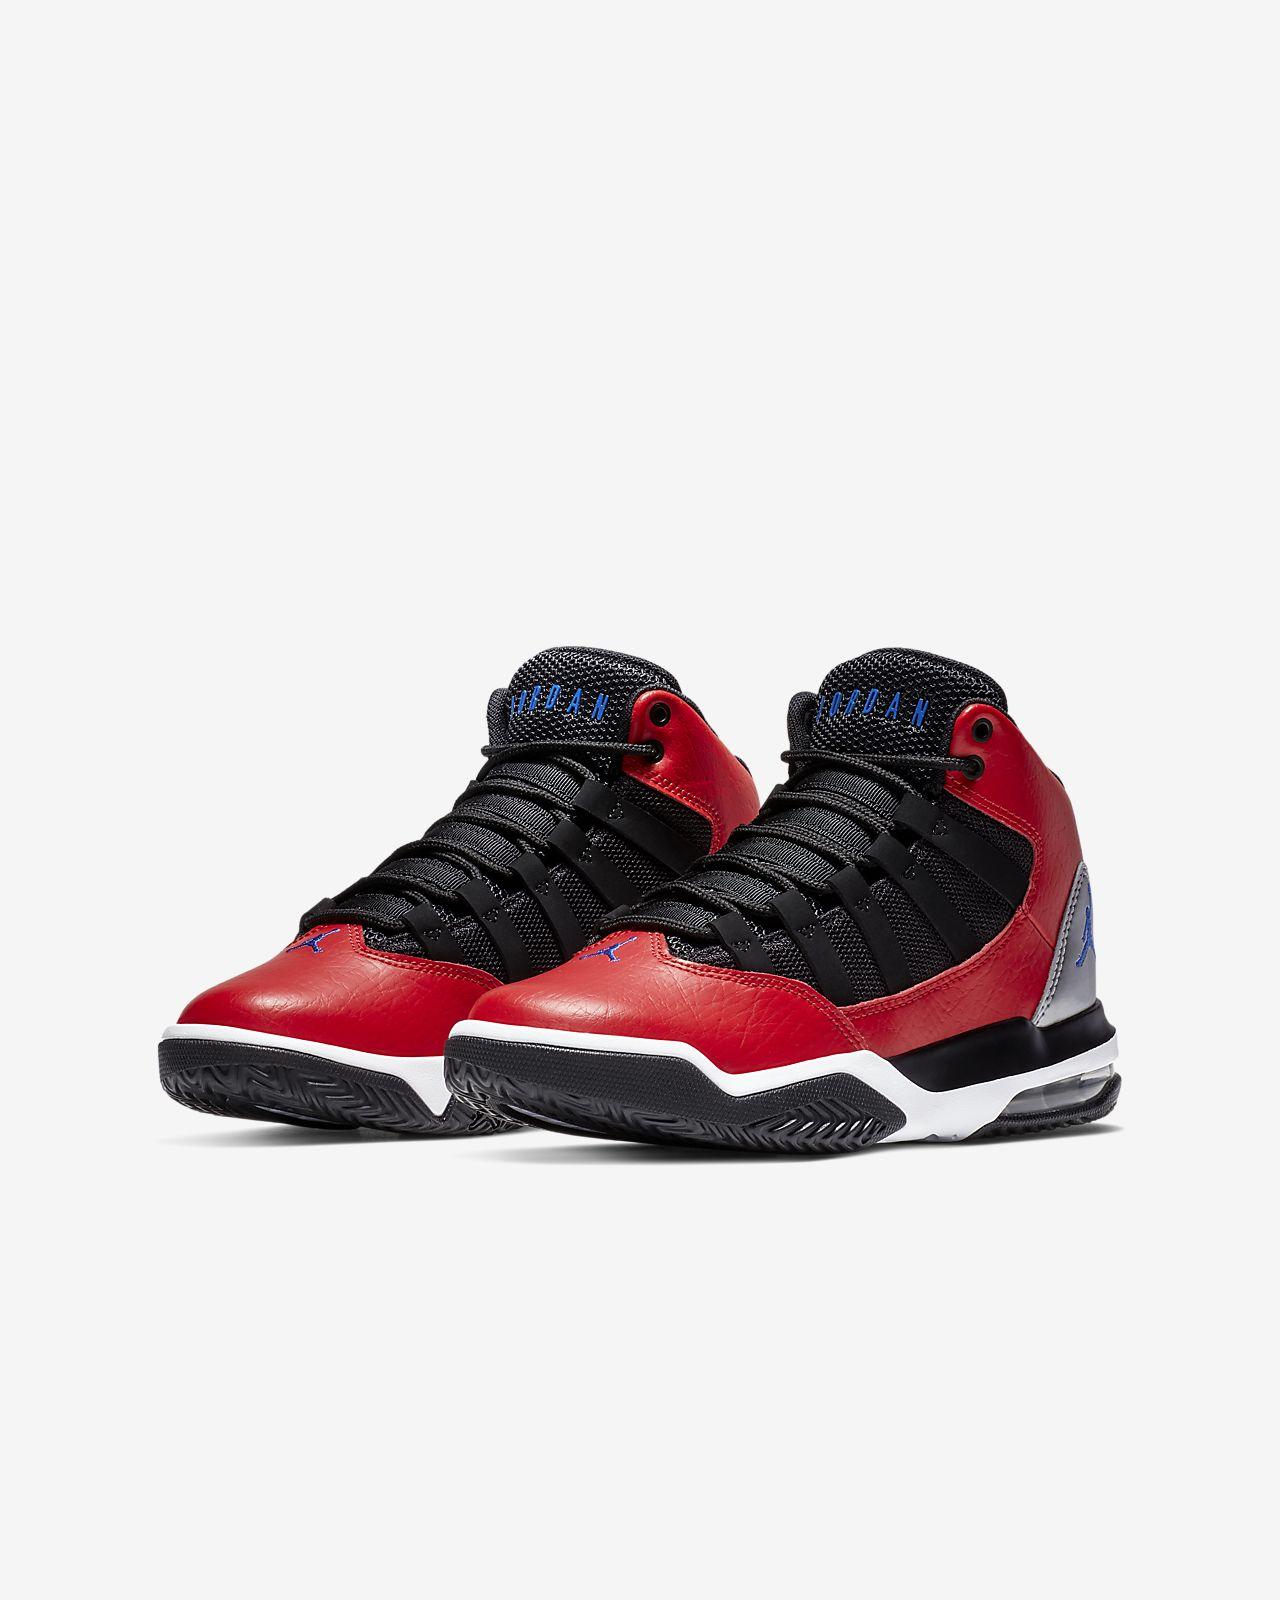 2b67076f49 Jordan Max Aura Older Kids' Shoe. Nike.com GB